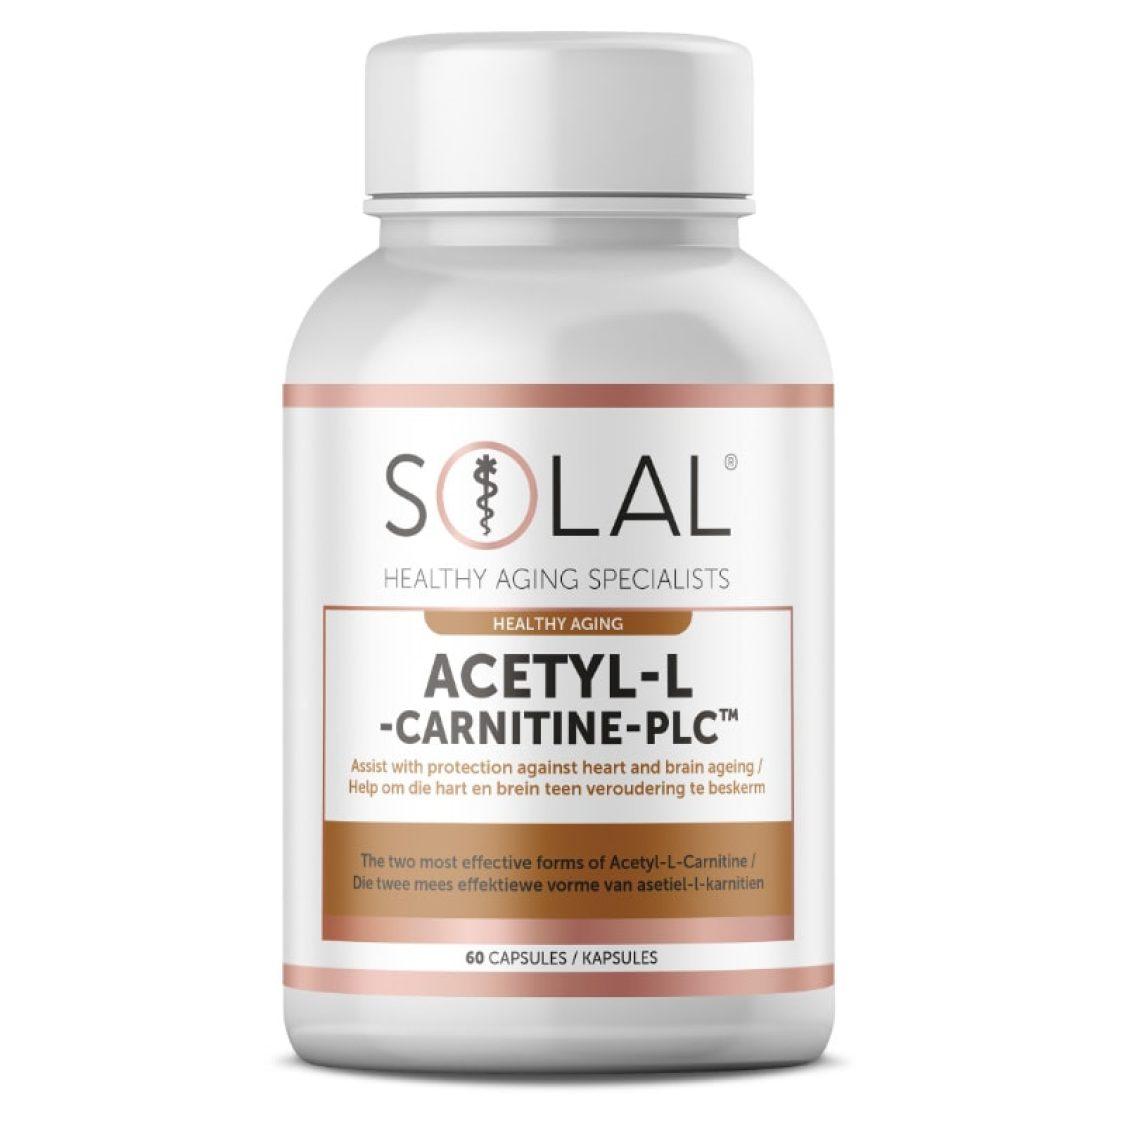 Solal - Acetyl-L-Carnitine - PLC